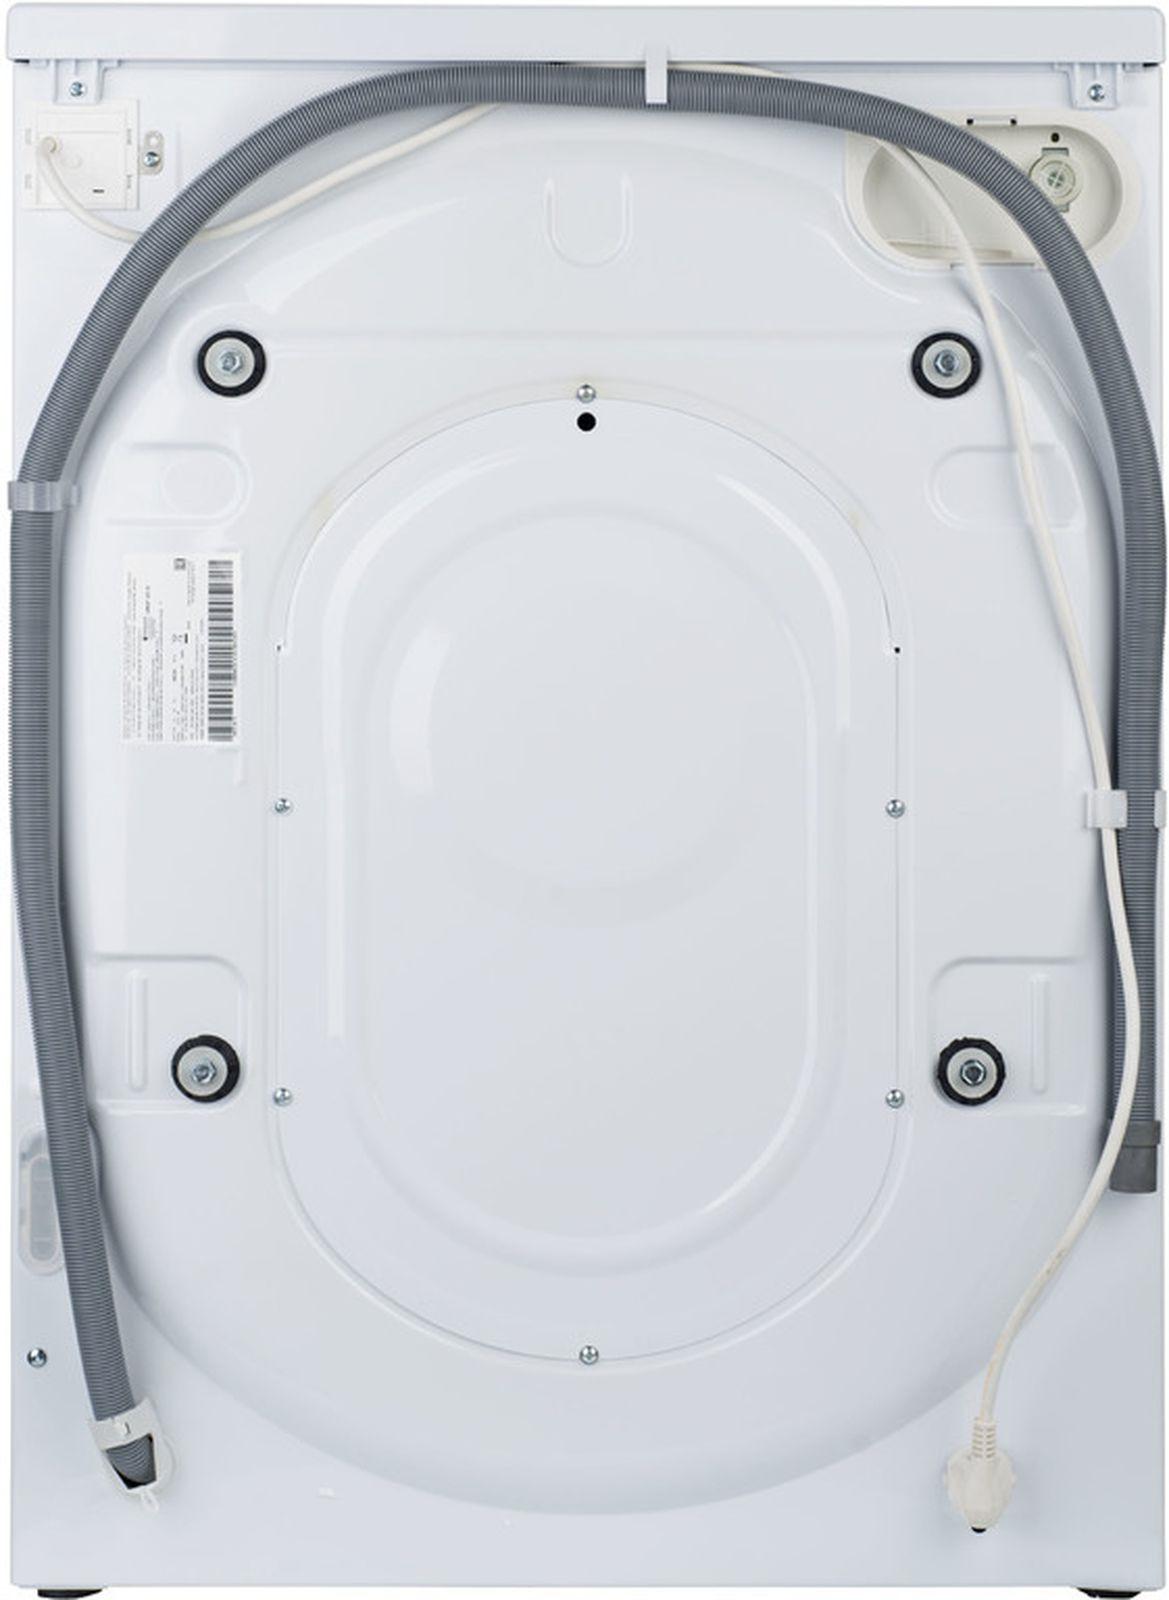 Стиральная машина Hotpoint-Ariston VMUF 501 B, 88959, белый Hotpoint-Ariston